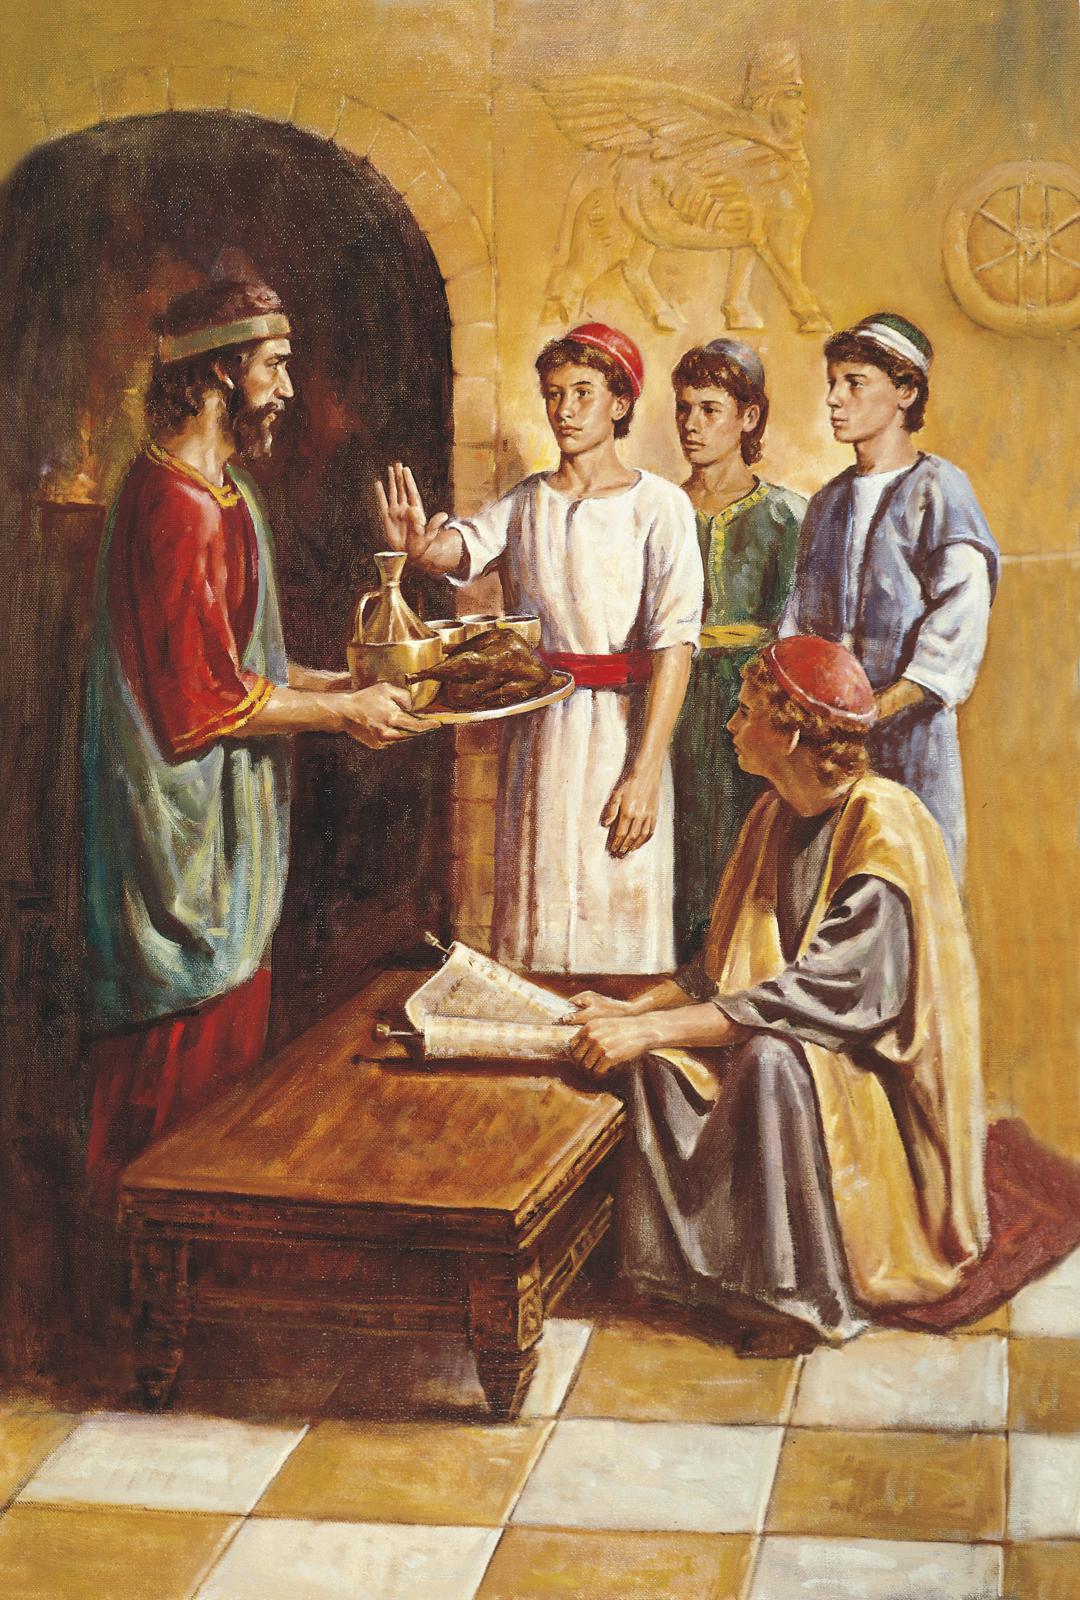 sda manual of bible doctrines pdf